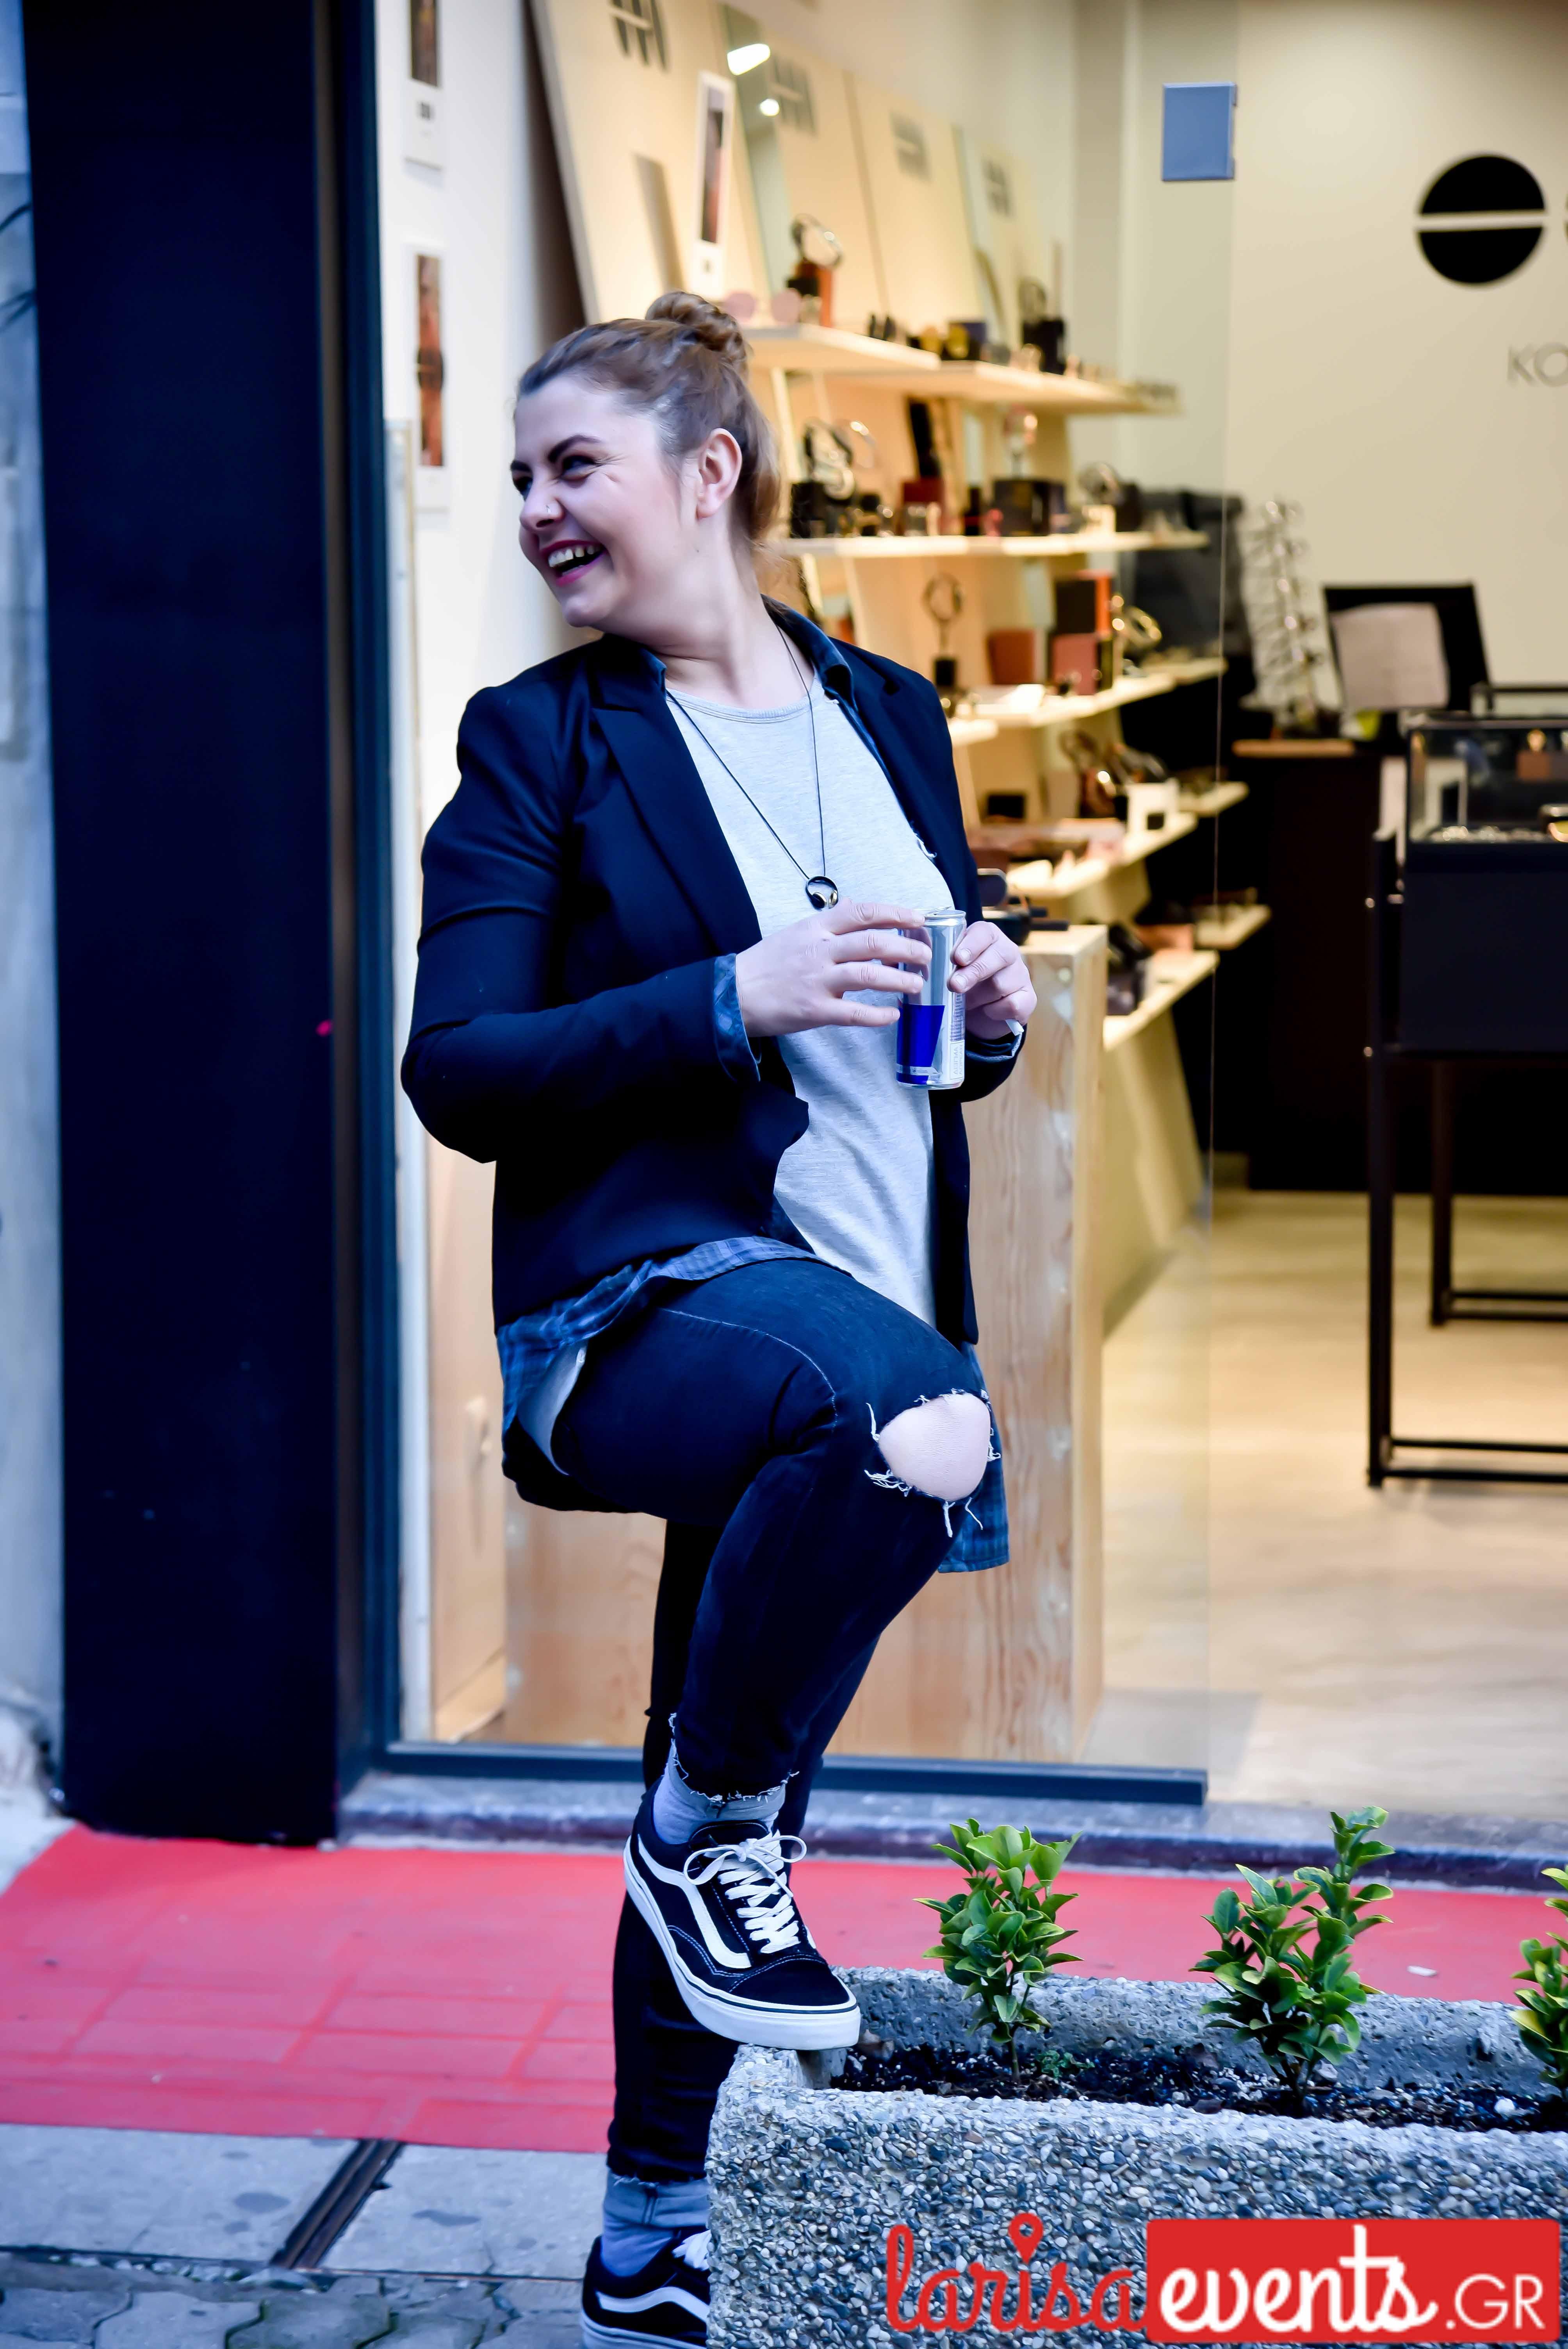 LAZ 7341 - Λάρισα's Street Style | Οι γυναίκες της πόλης σε street style clicks!